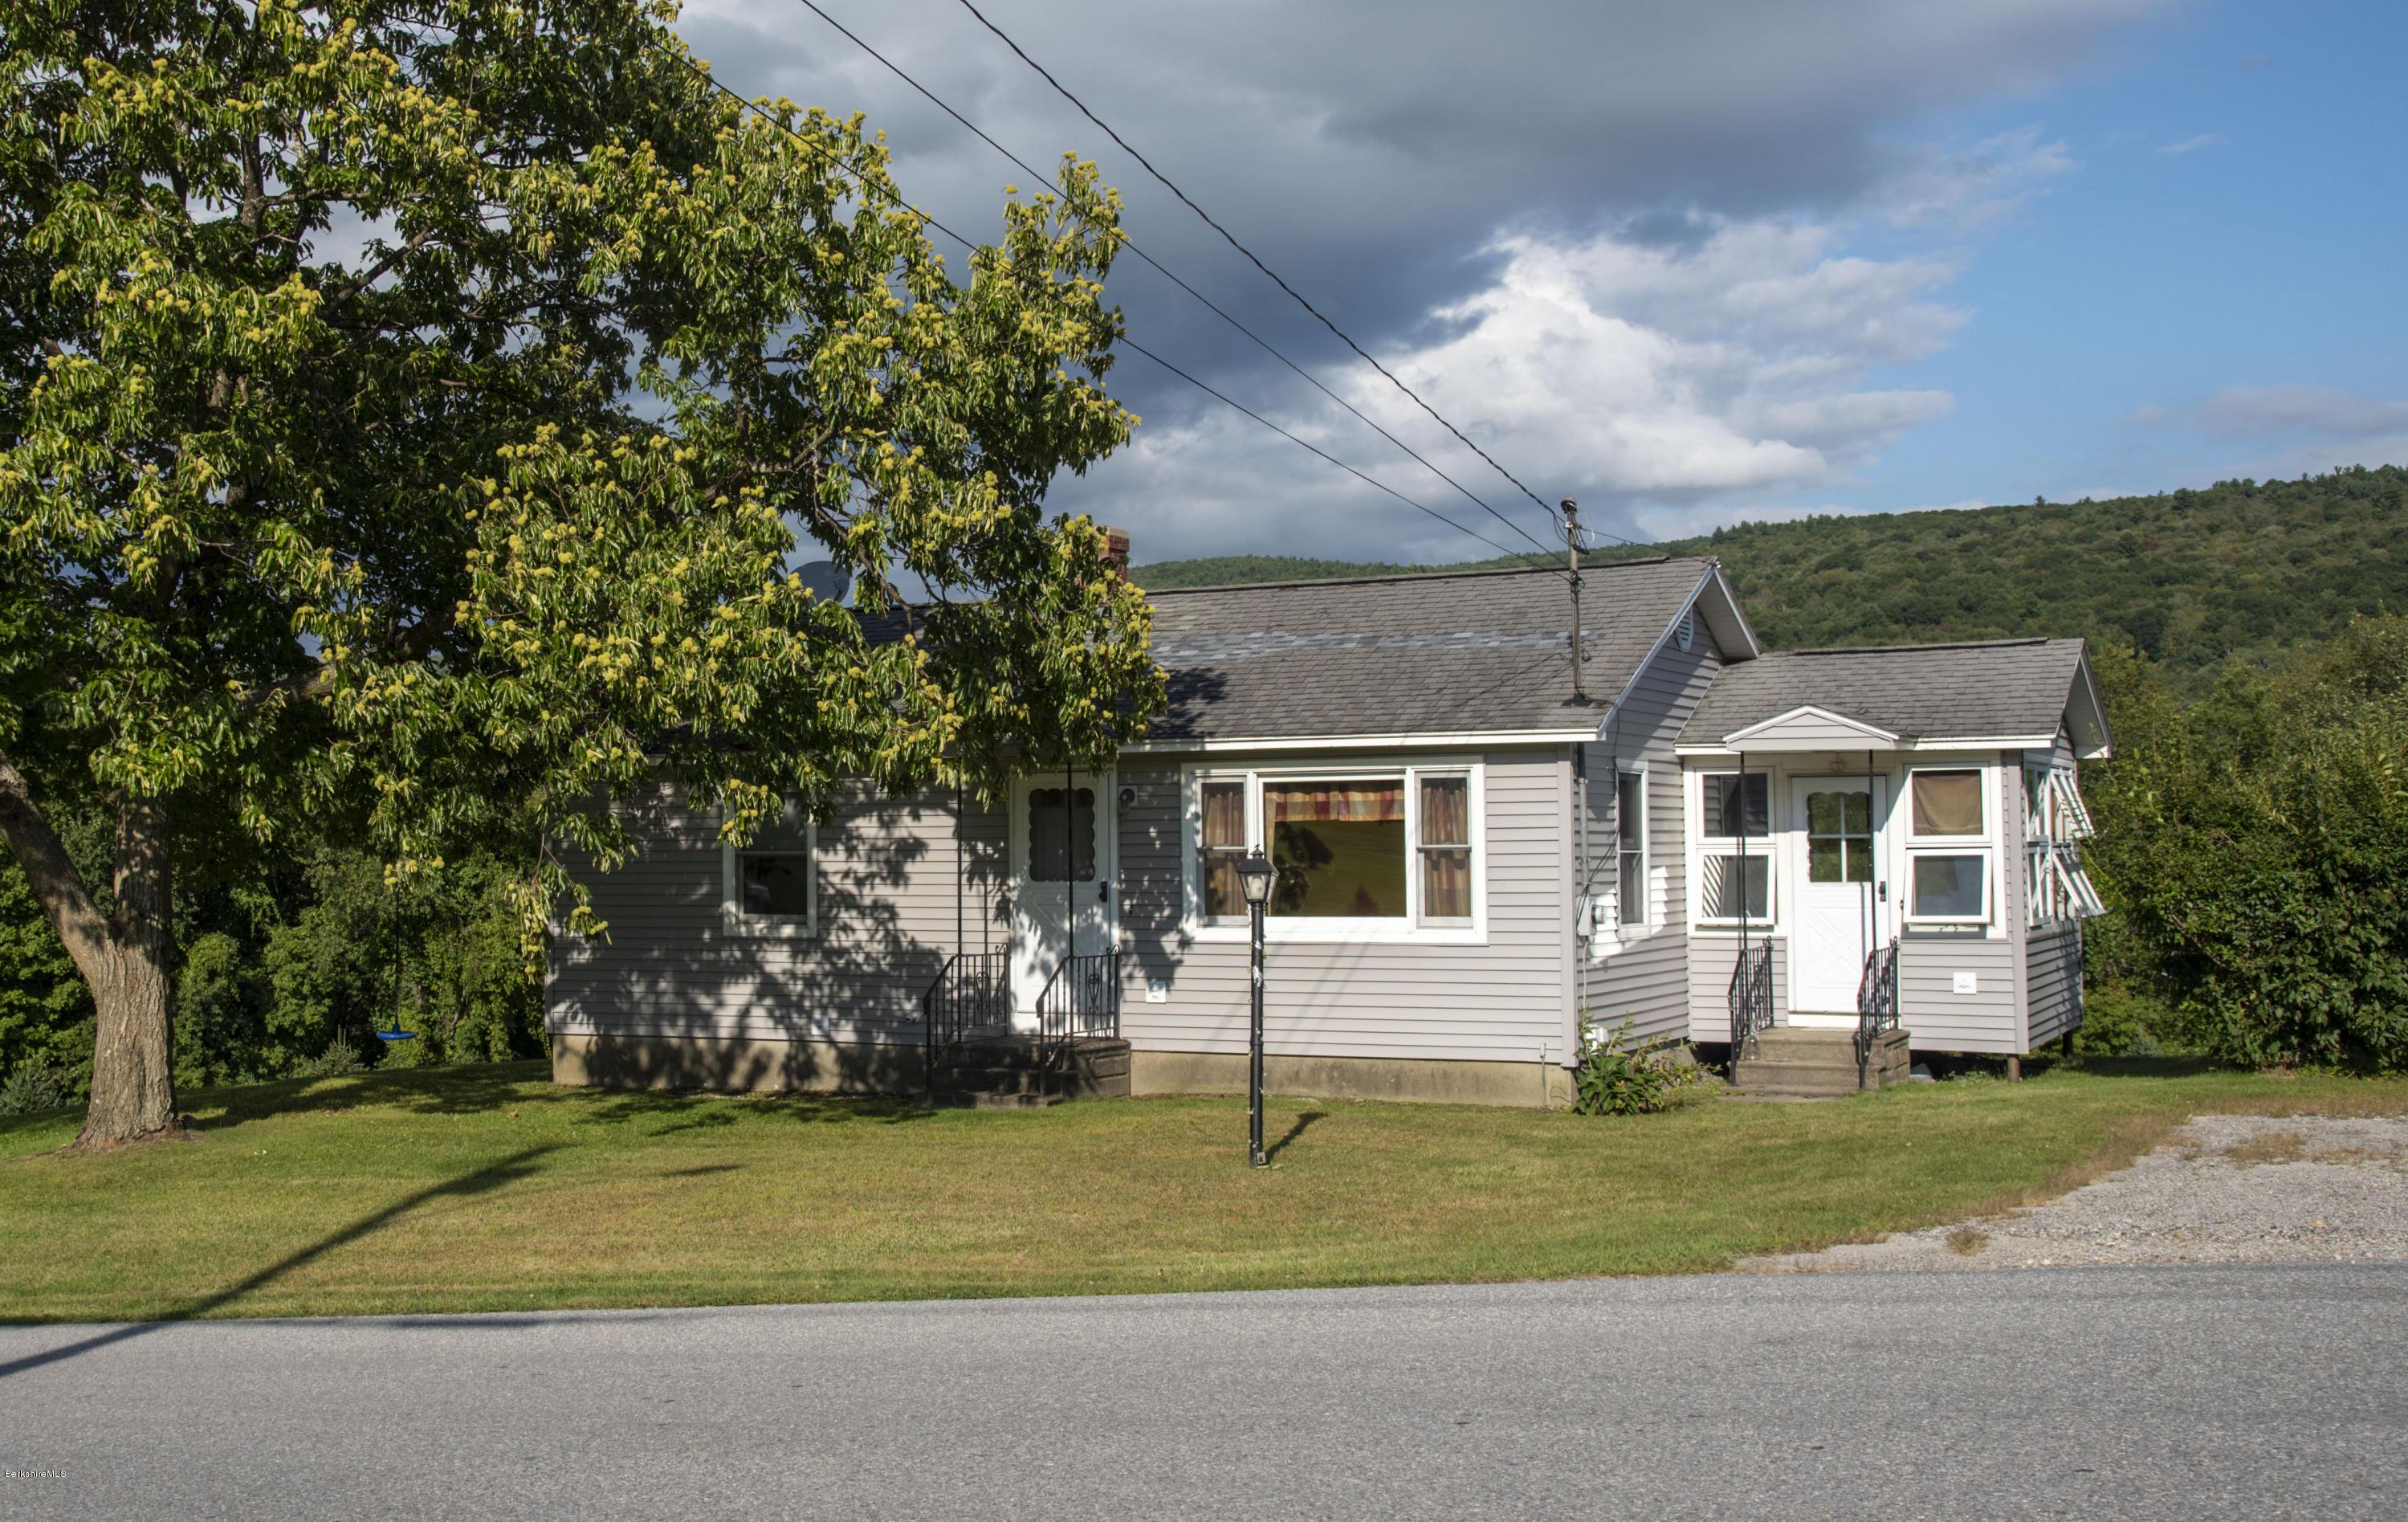 555 Hill Rd Pownal VT 05261